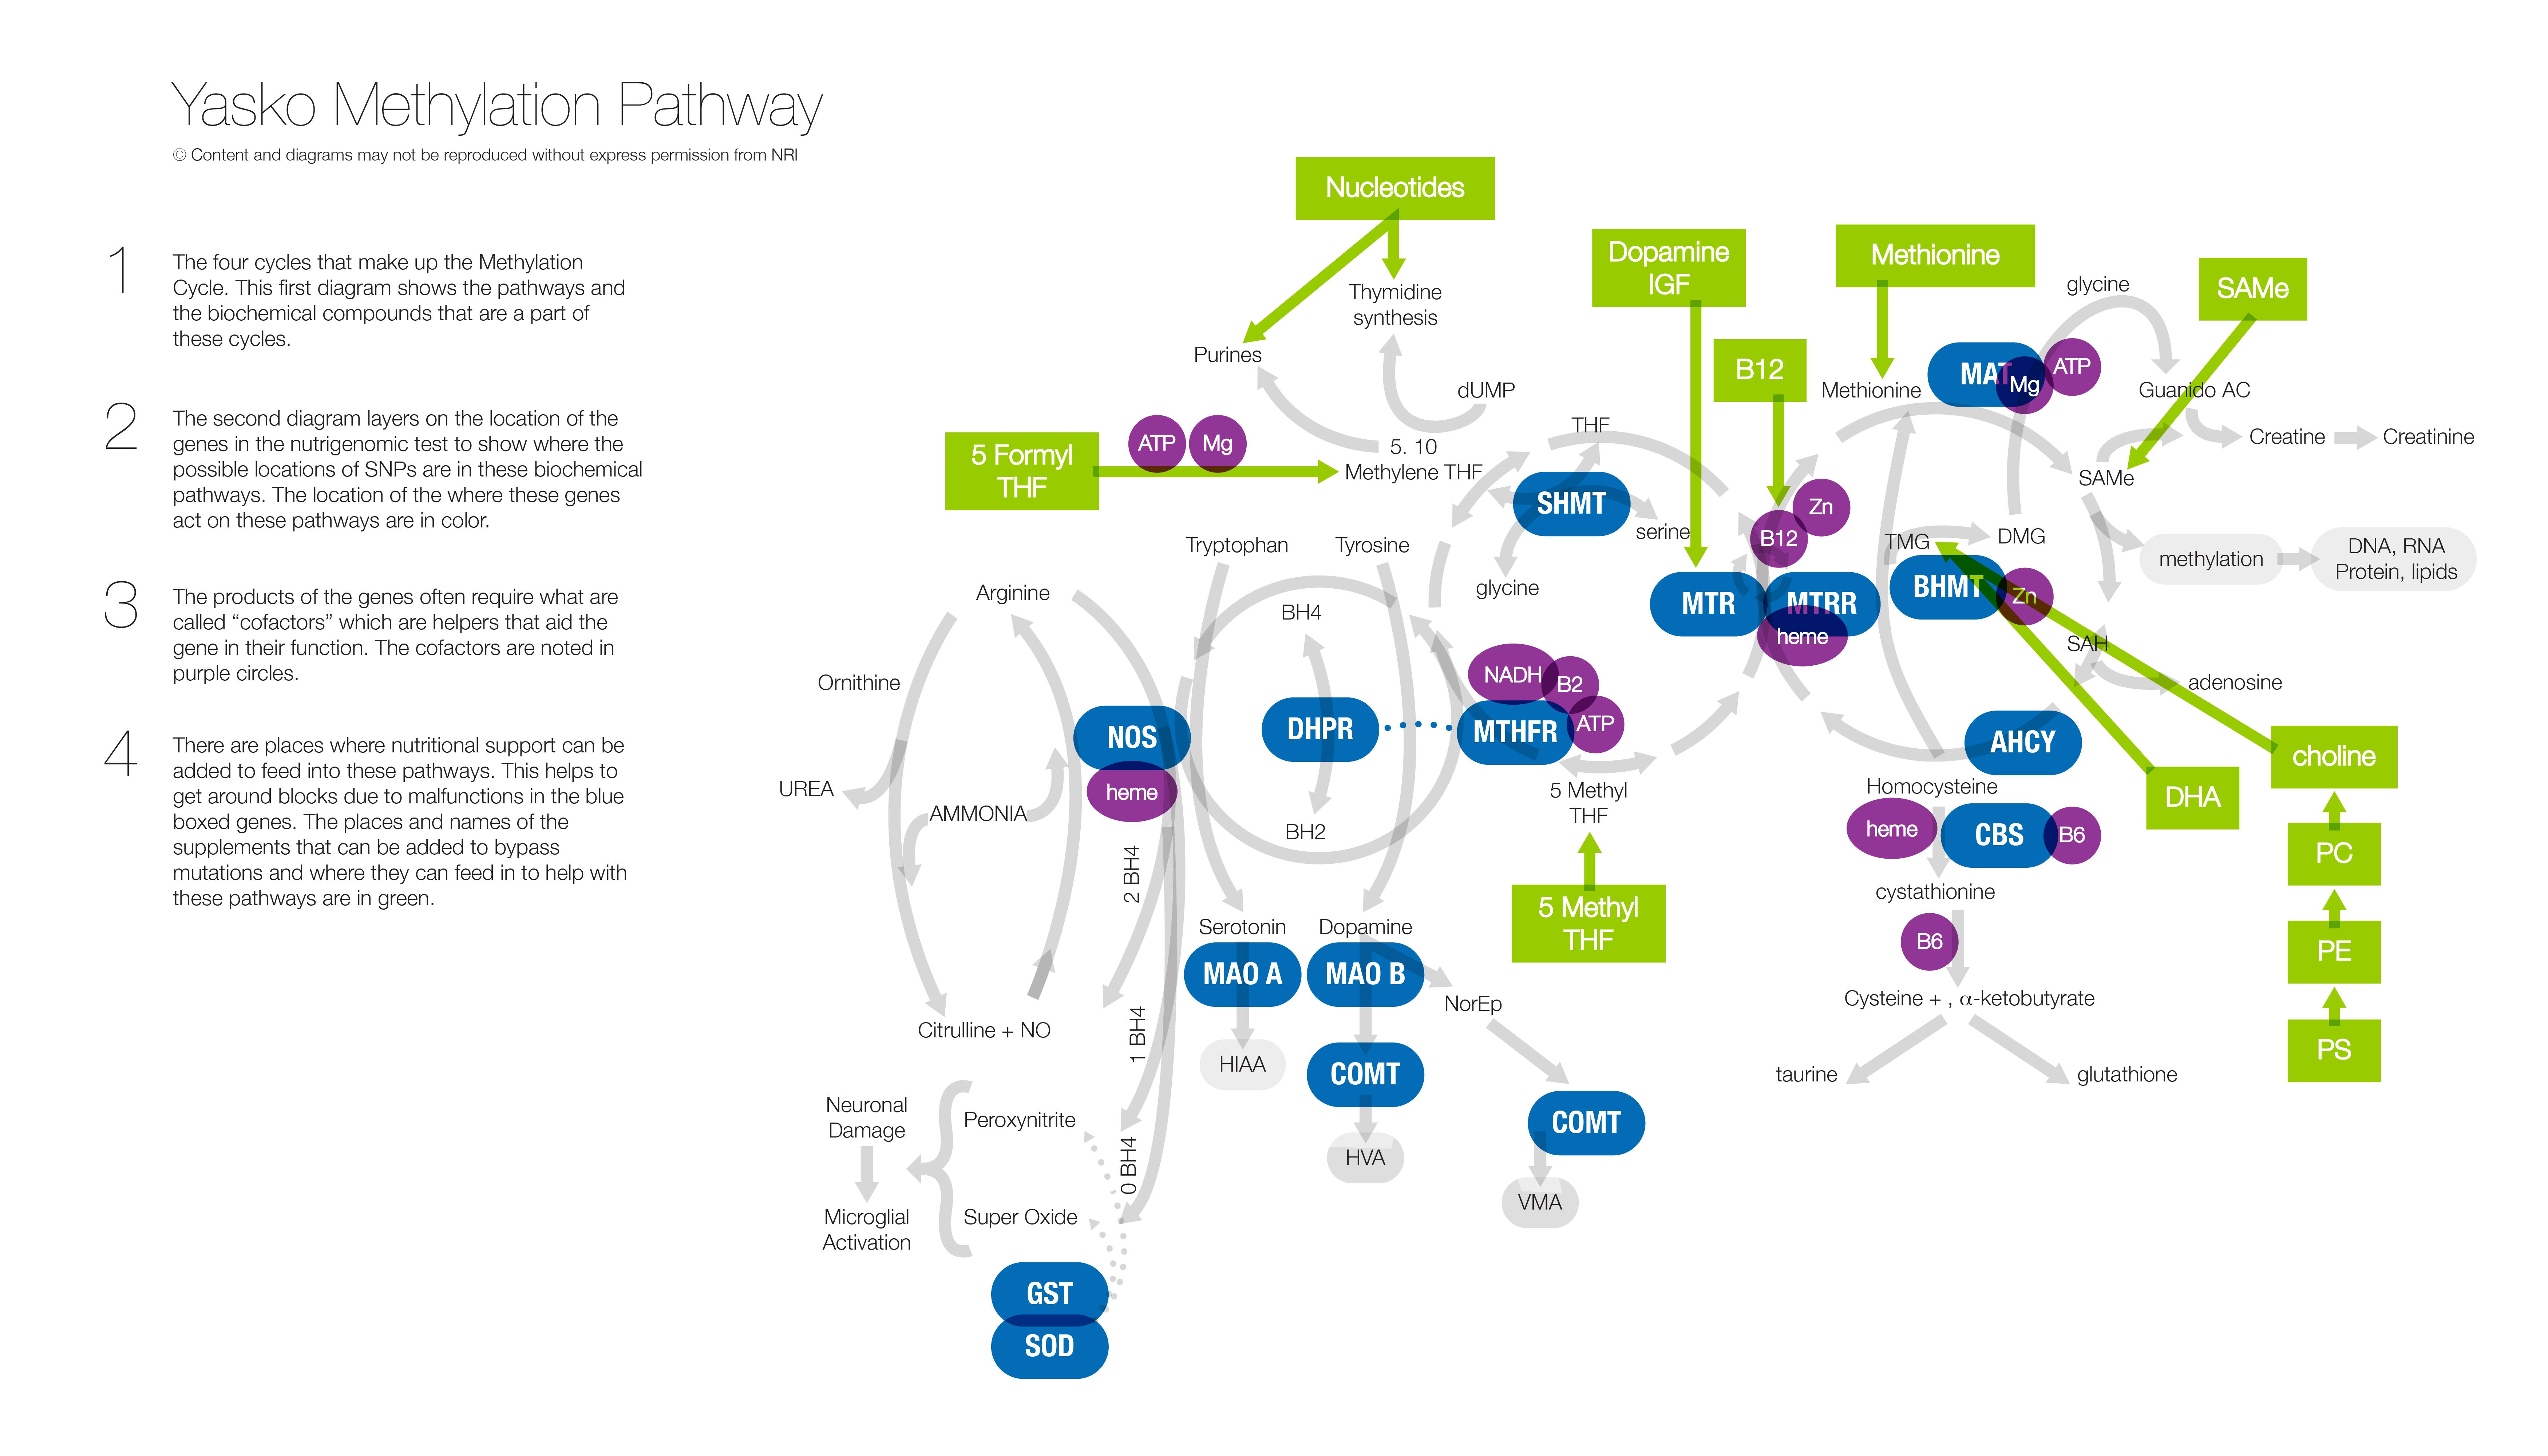 Yasko Methylation Pathway - 4